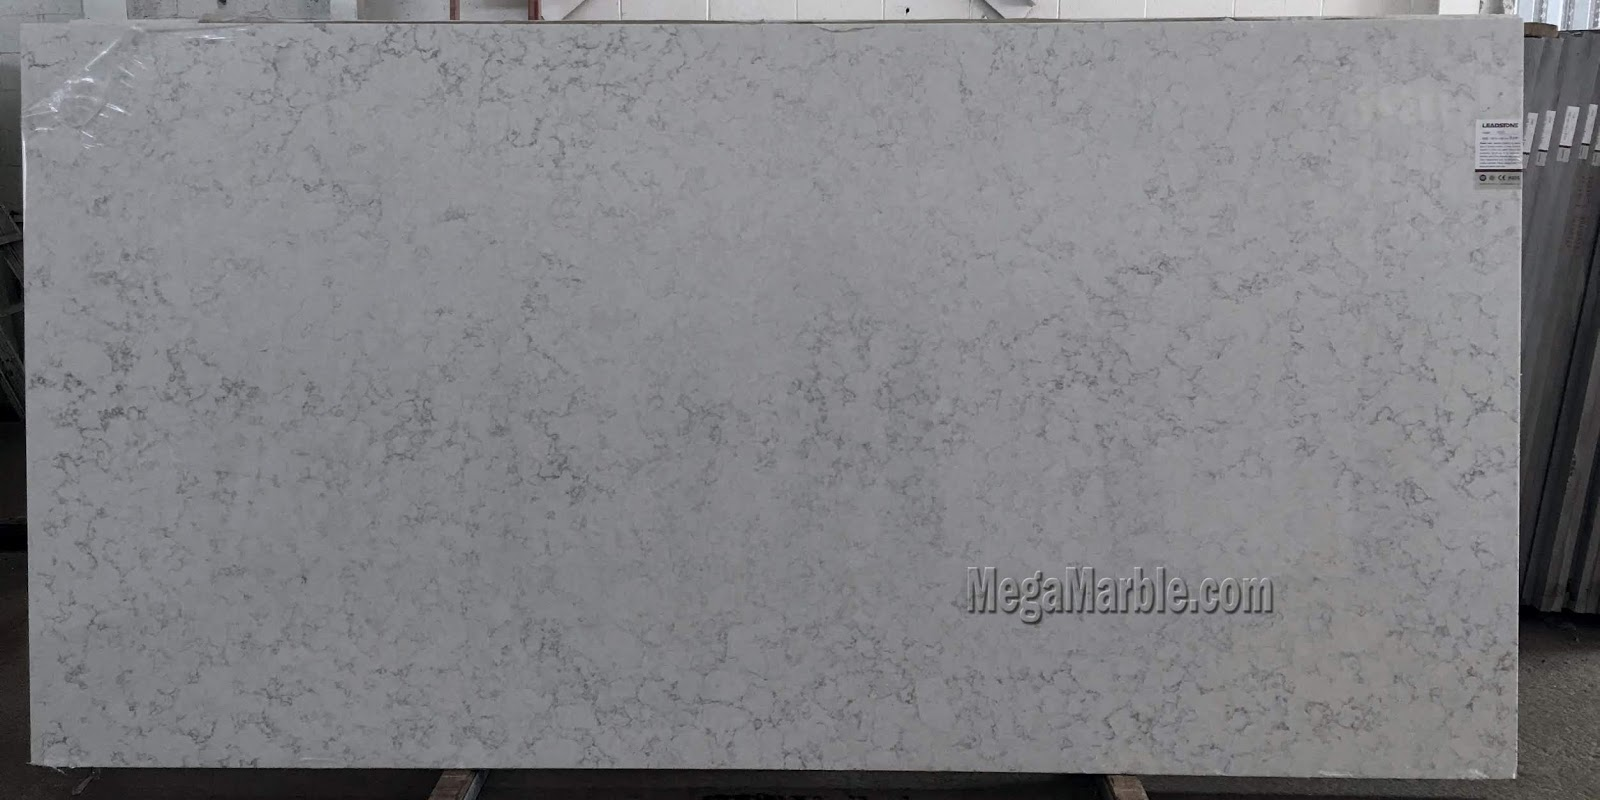 Quartz Countertops That Look Like Marble – Countertops New York